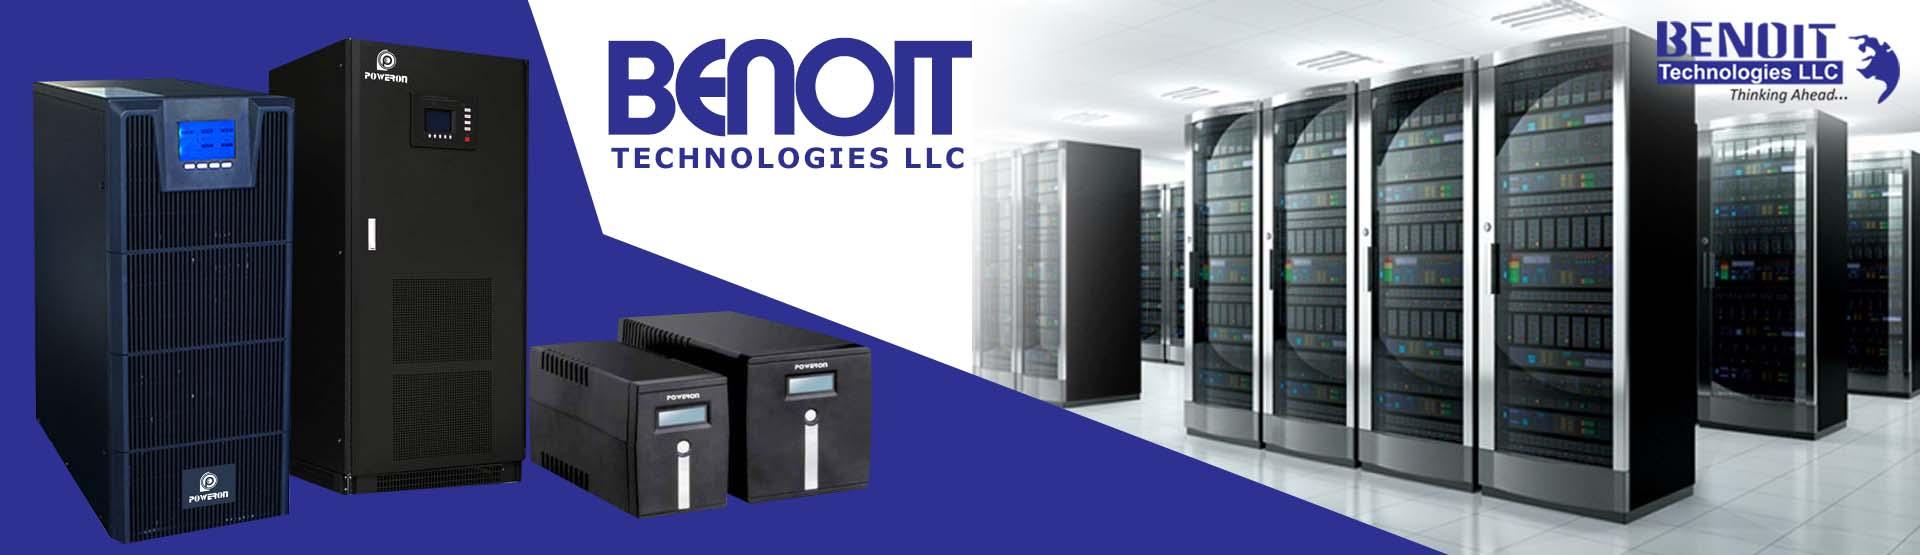 BENOIT TECHNOLOGIES LLC